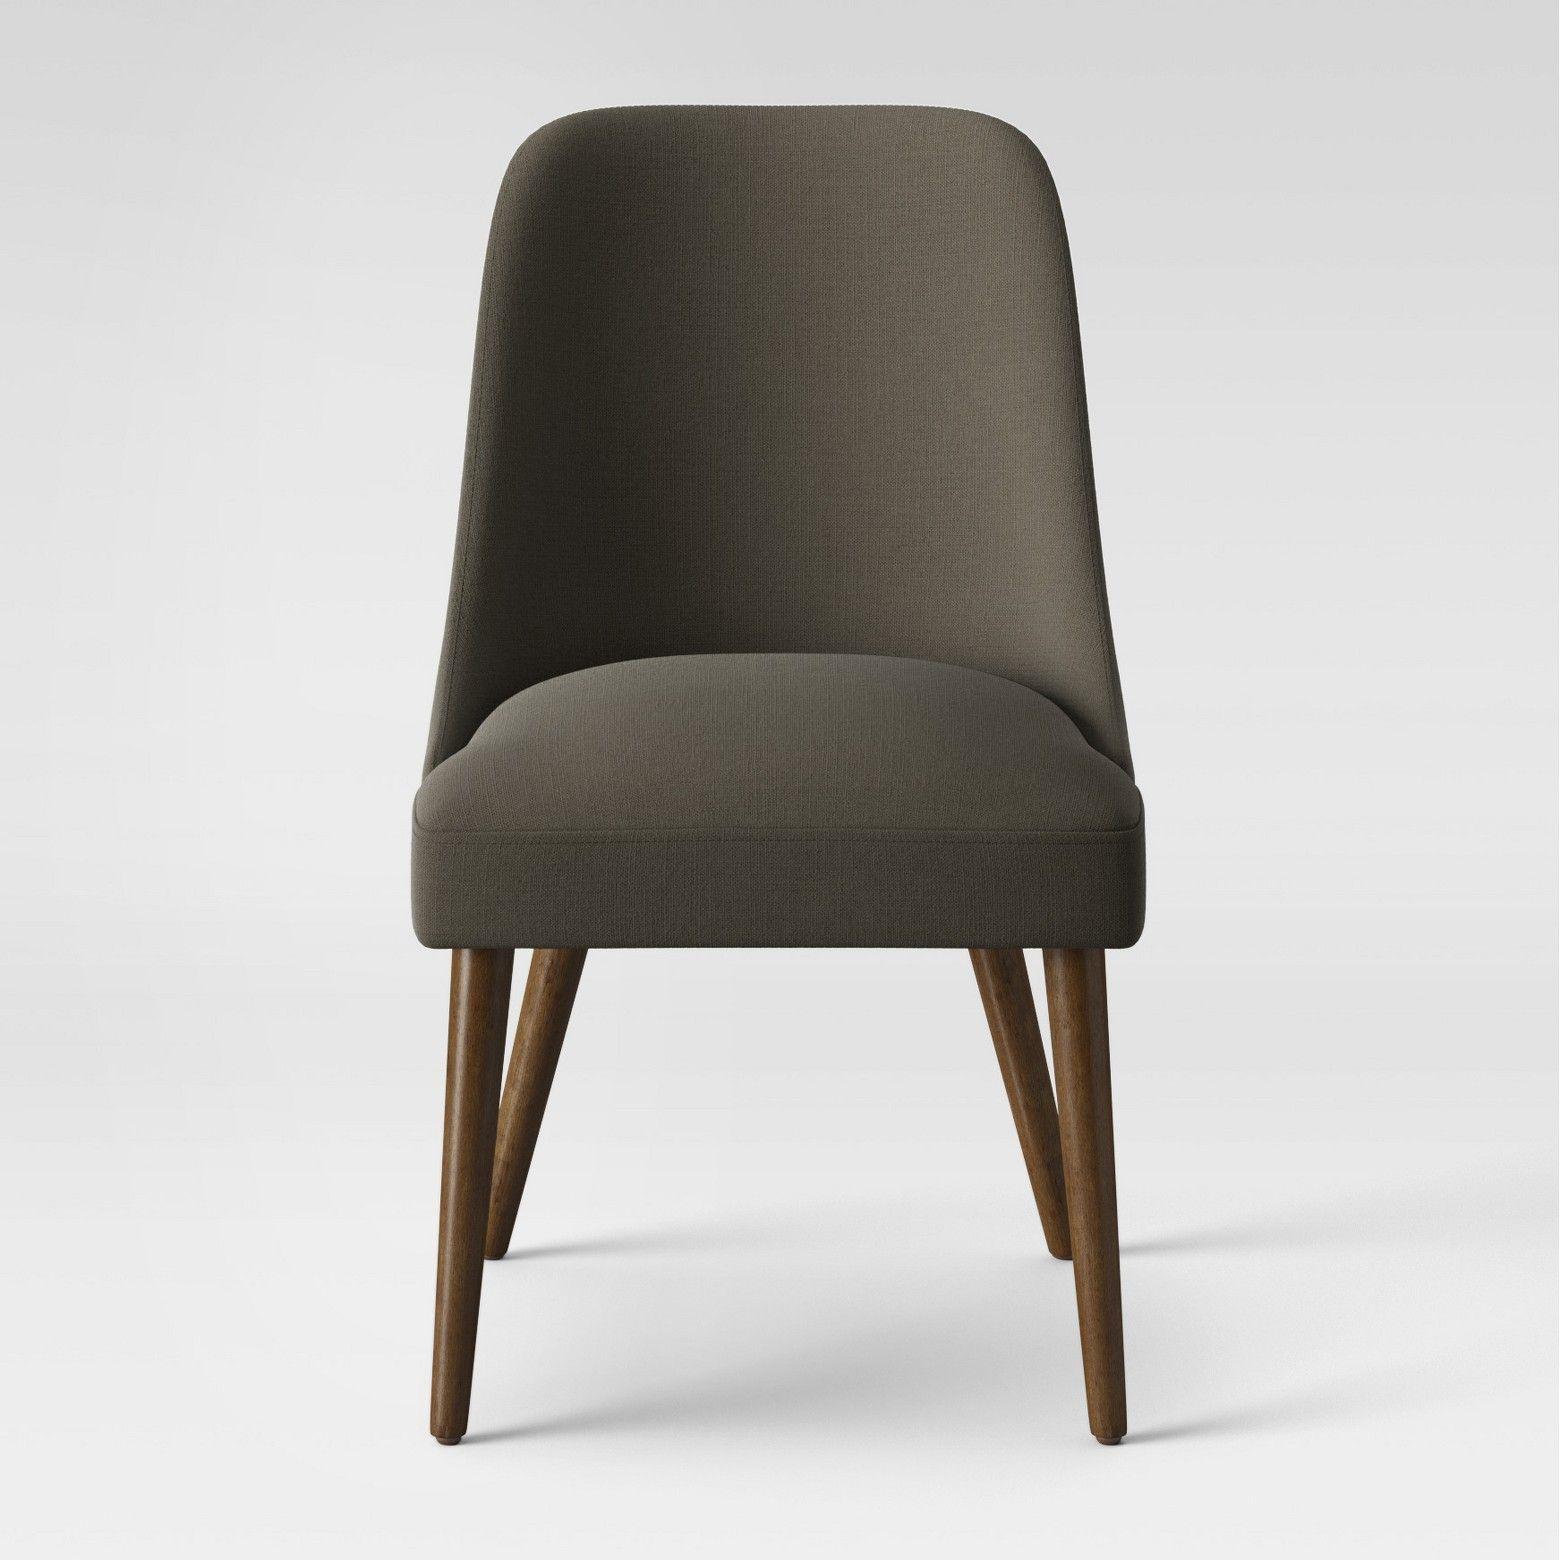 Geller Modern Dining Chair Slate Project 62 High Back Dining